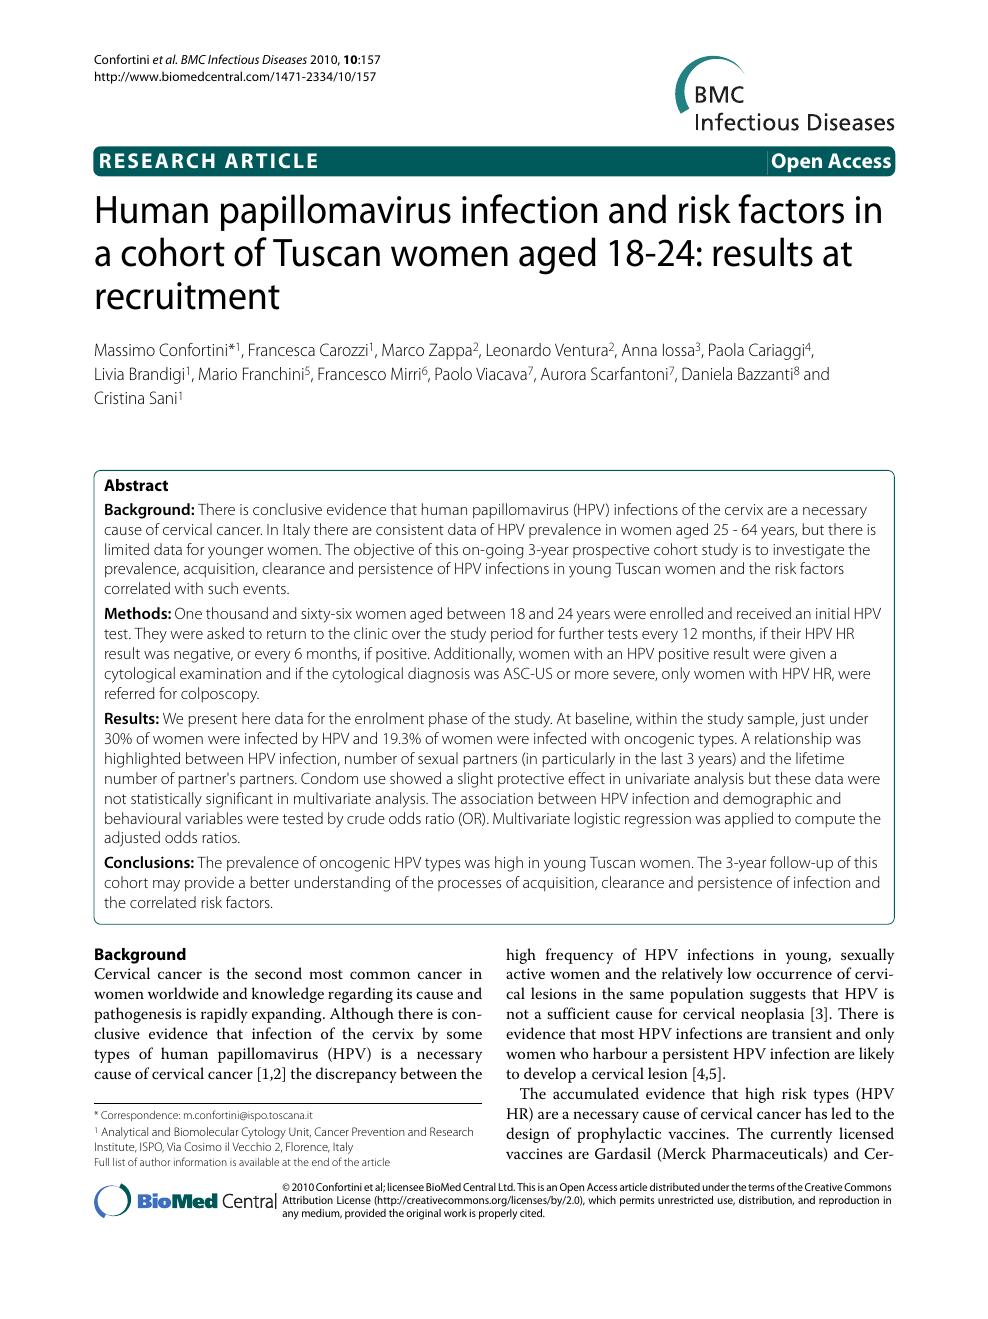 human papillomavirus infection who is at risk microbi de modele de margele